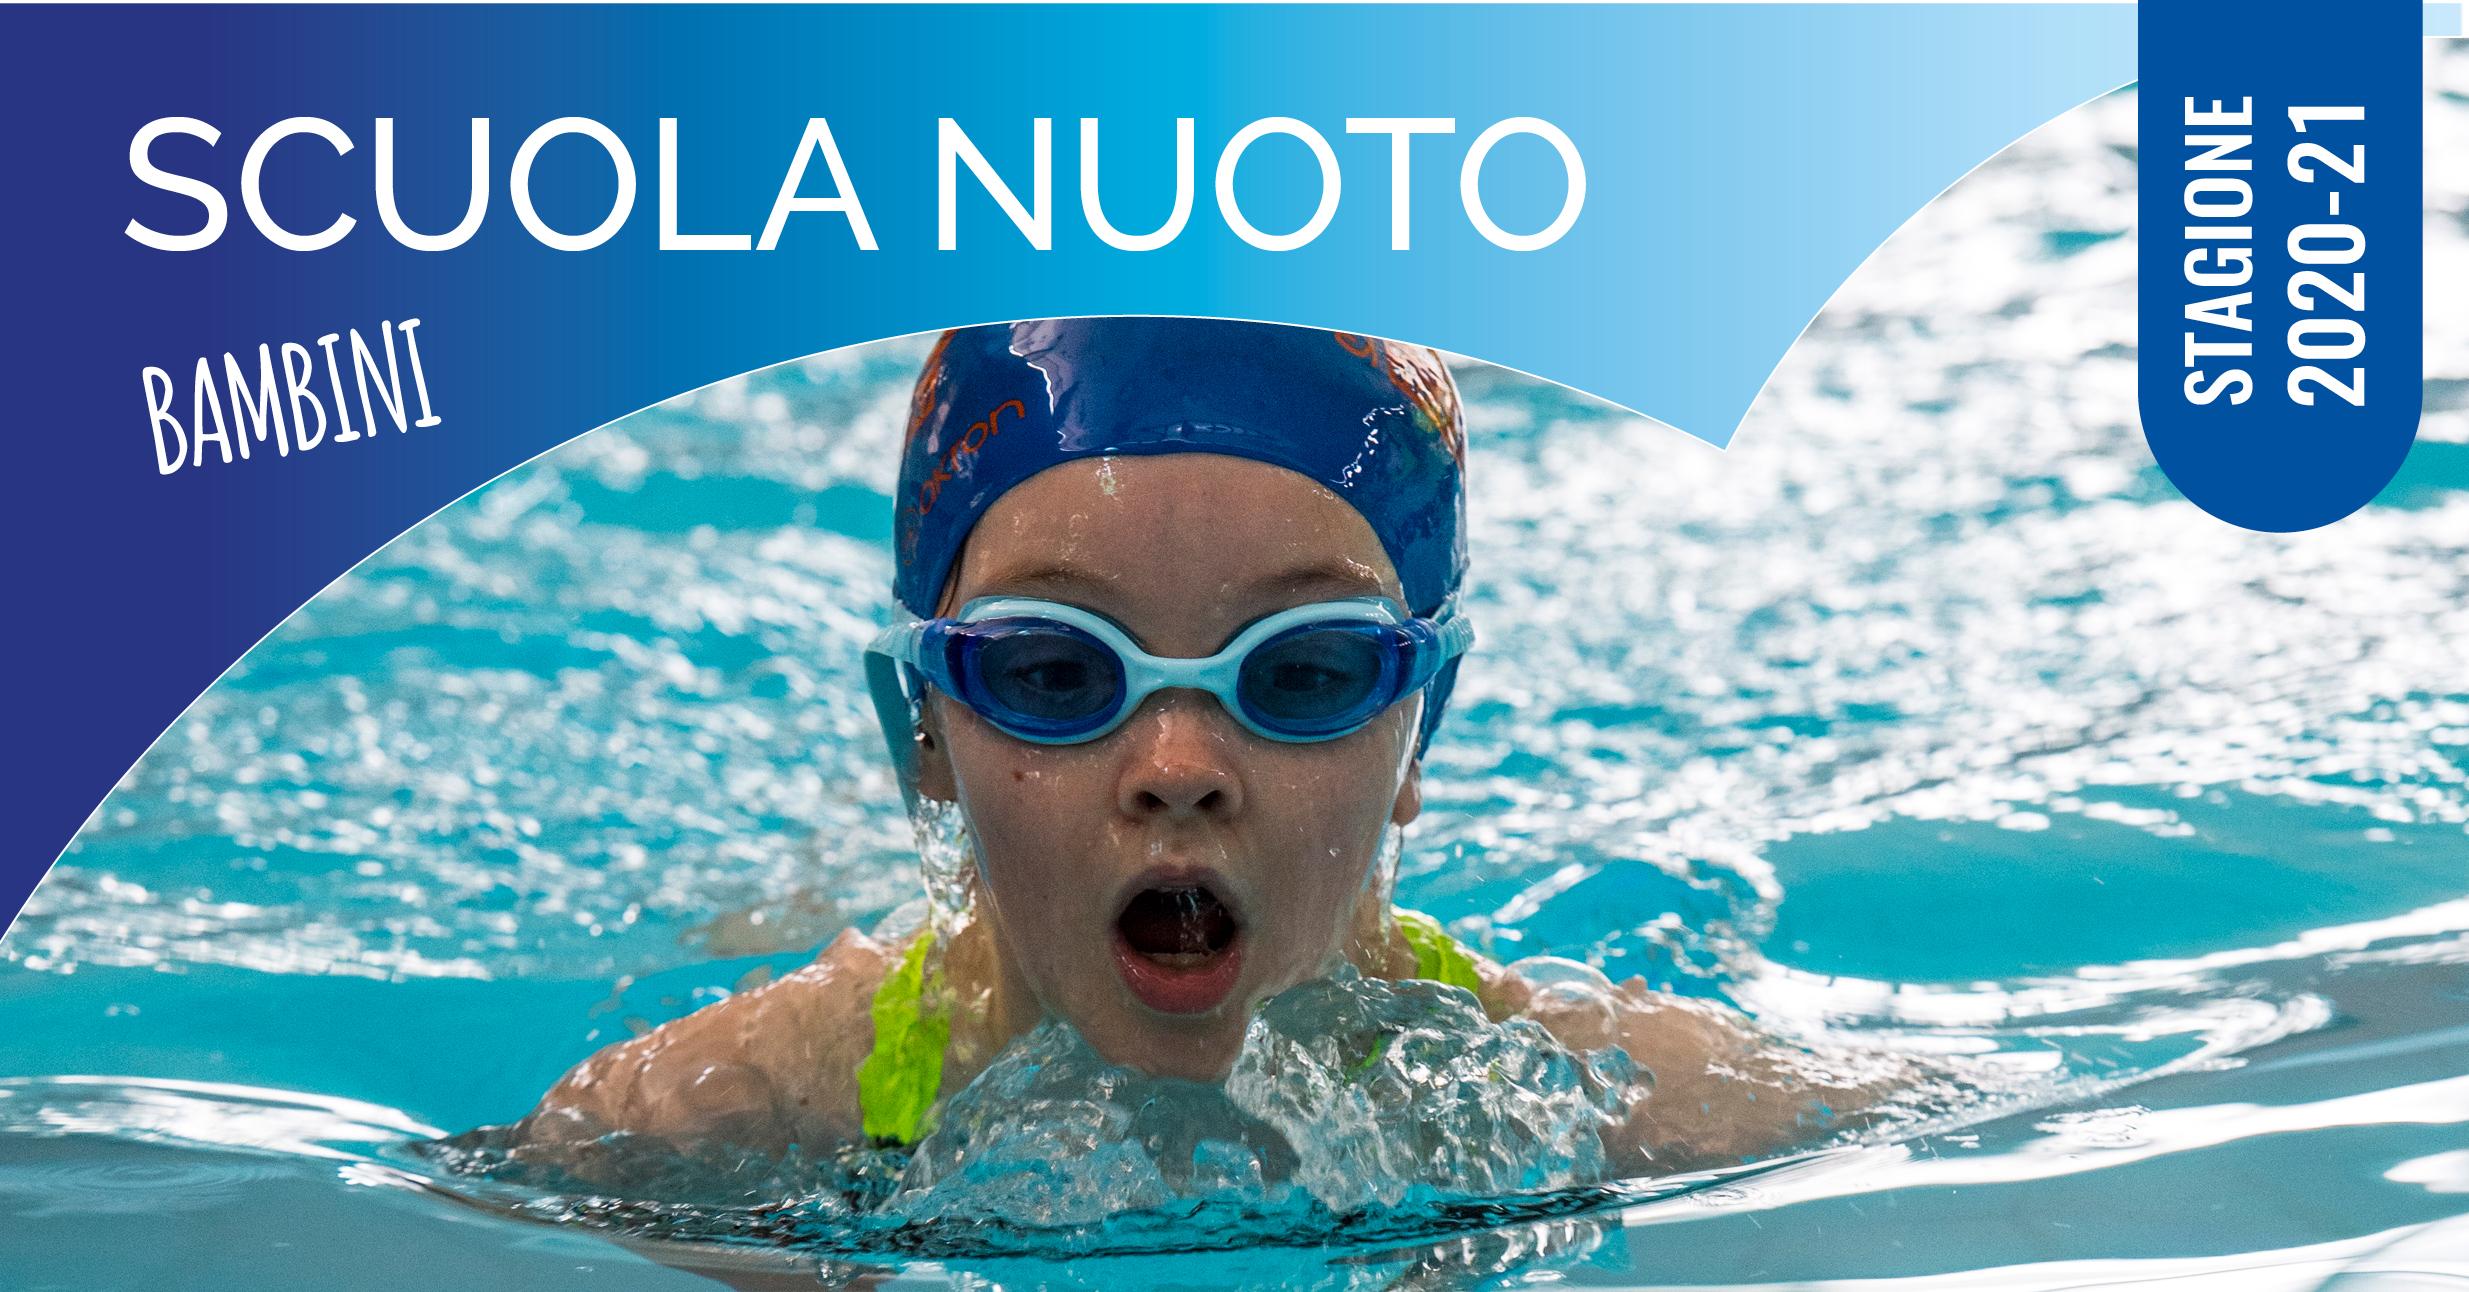 scuola-nuoto-bambini